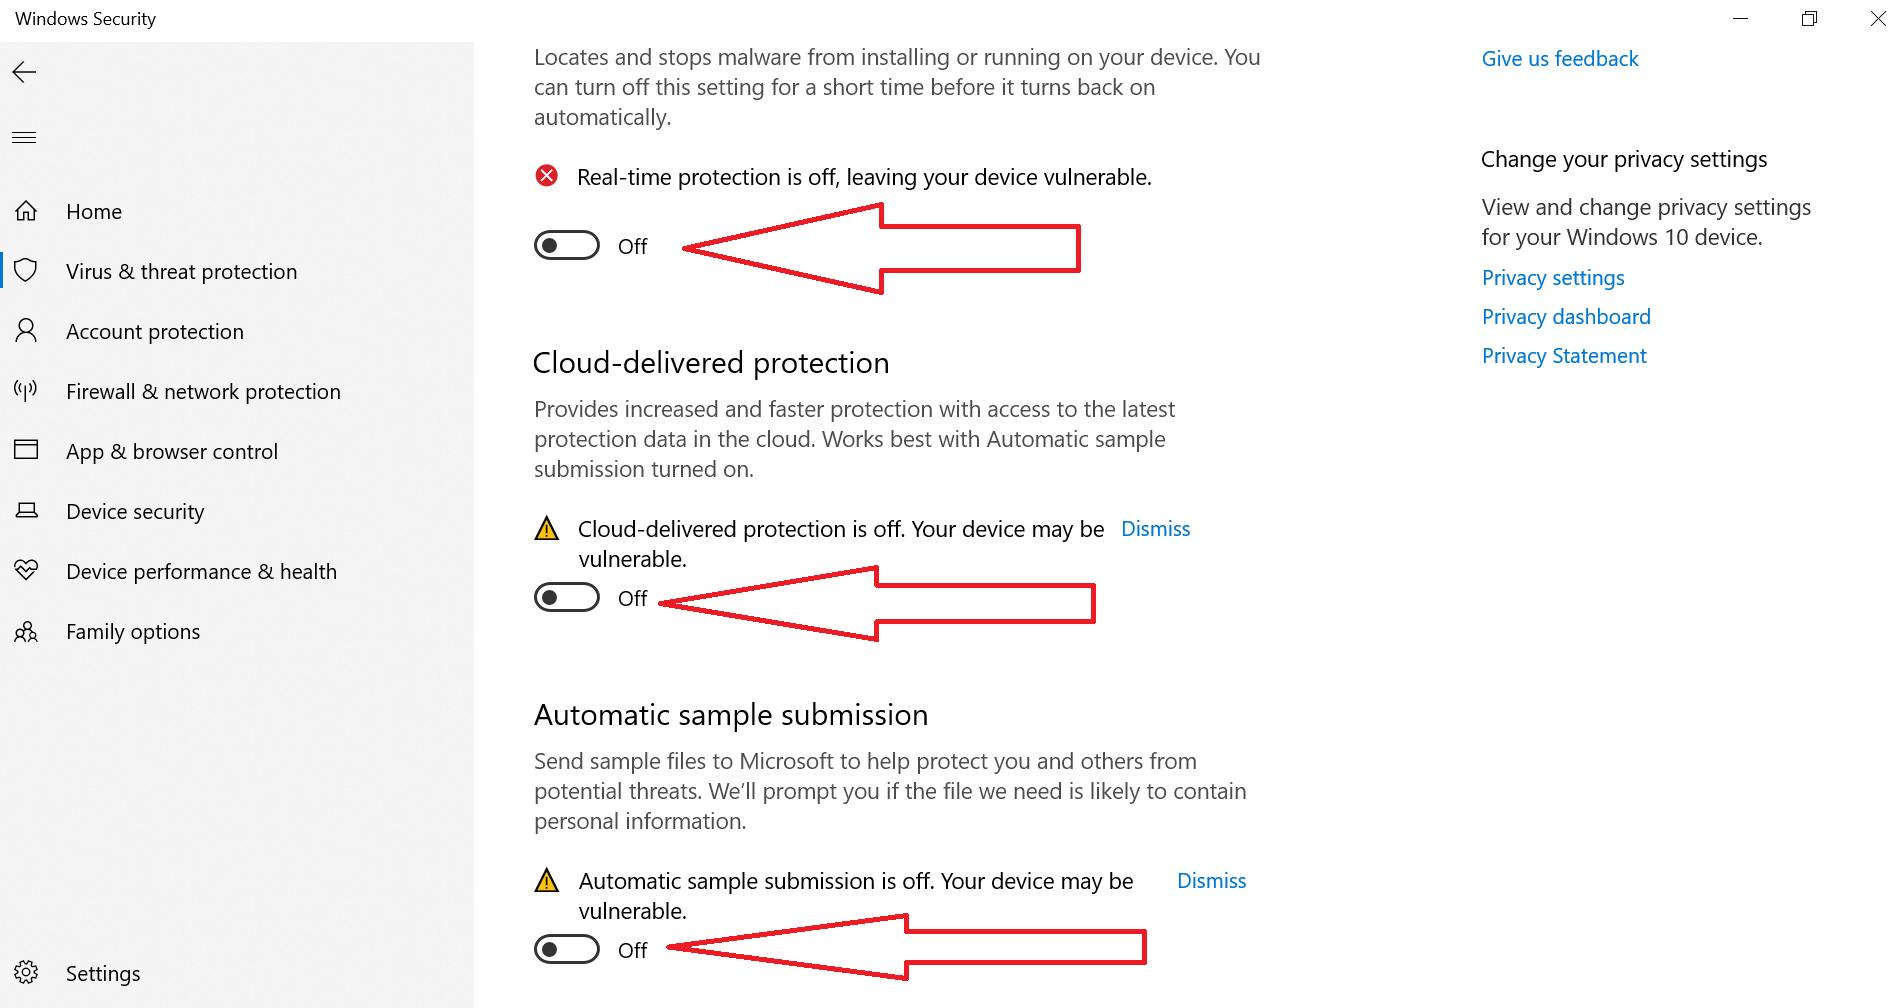 Hướng dẫn tắt Windows Defender trên Win 7, Win 10